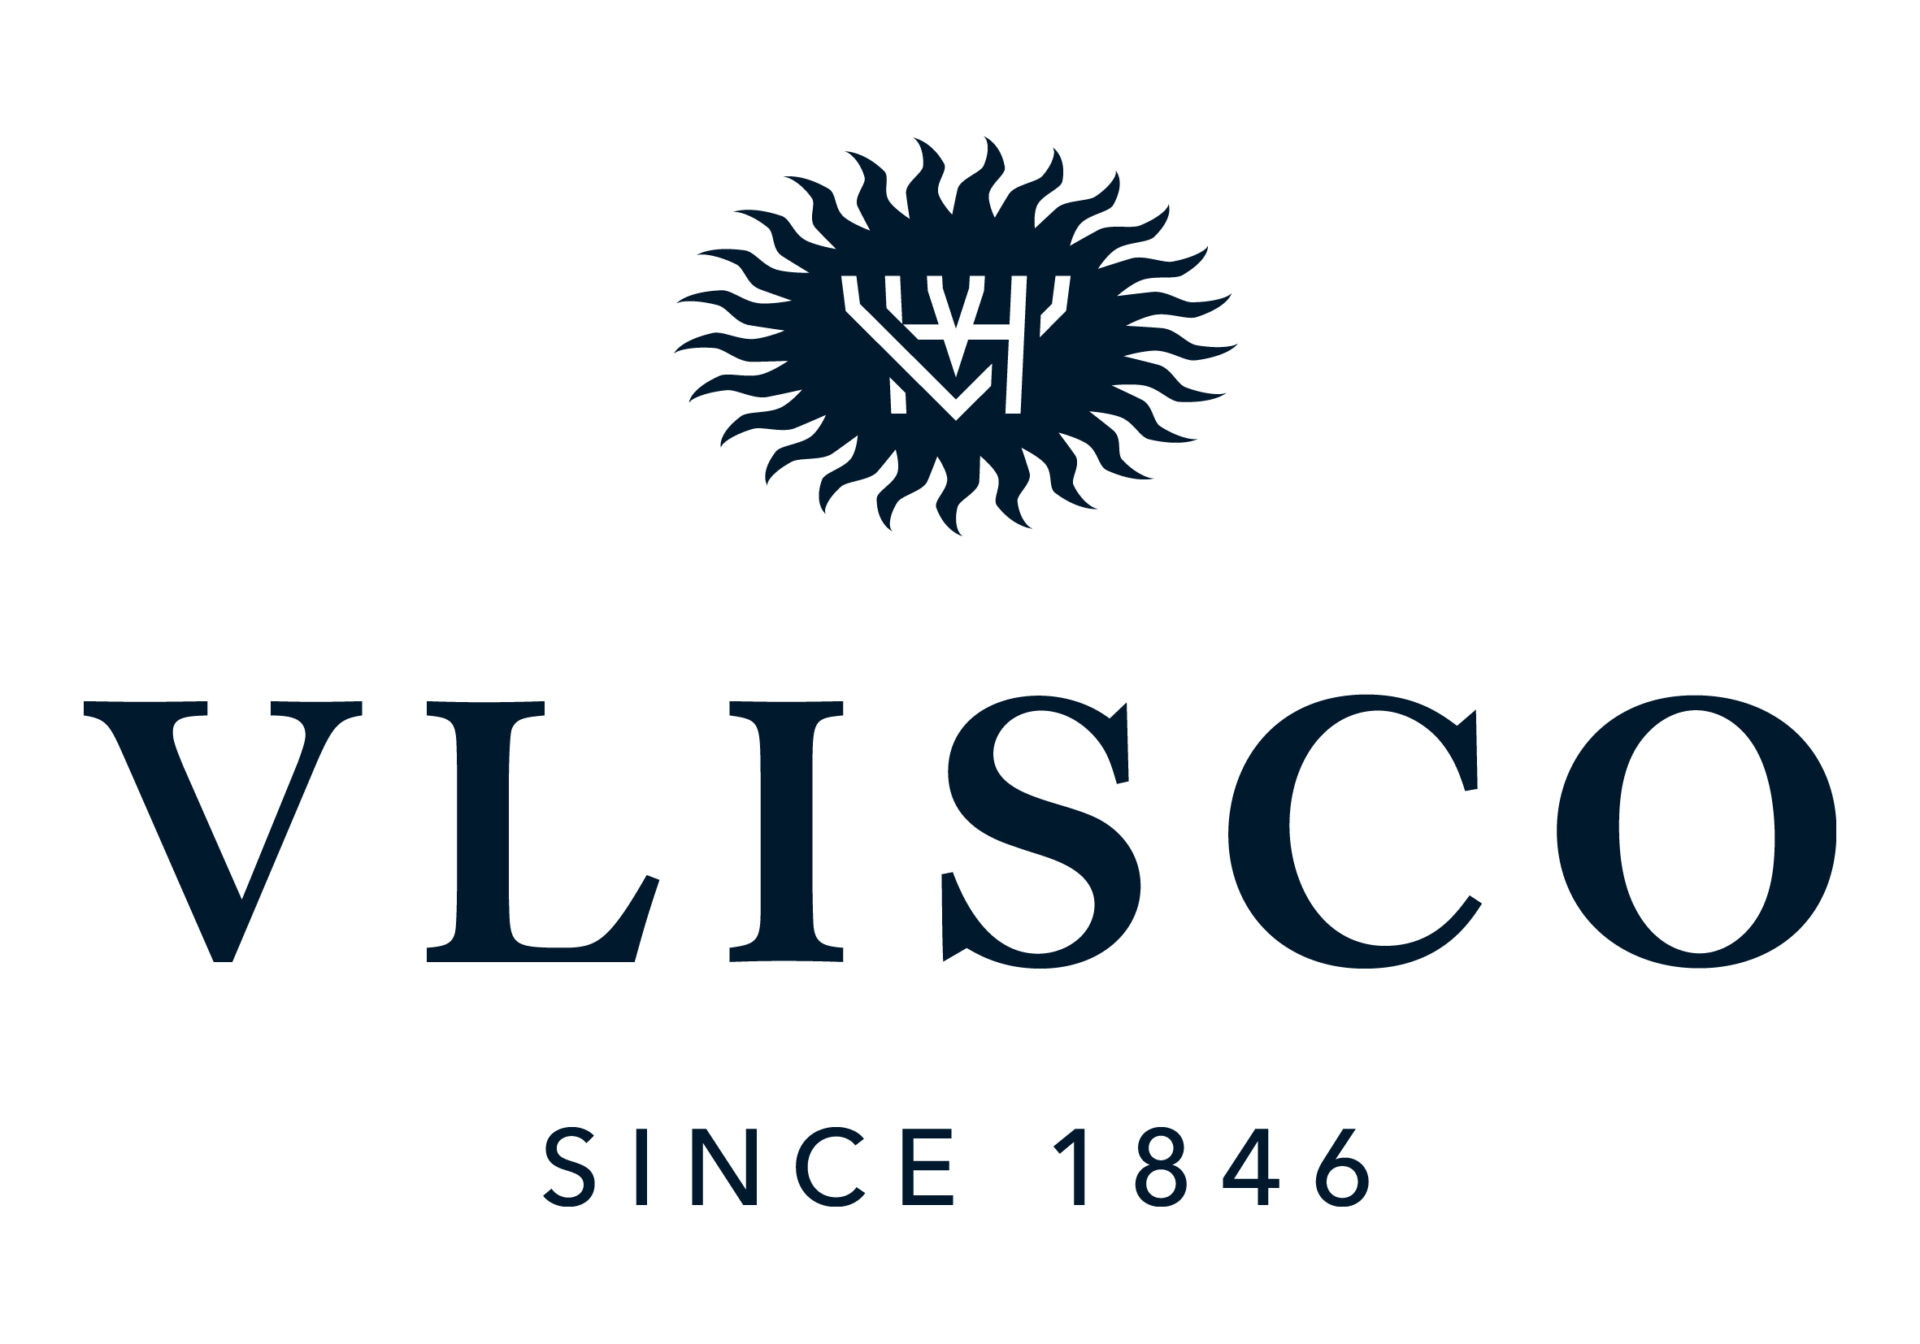 https://cottonmadeinafrica.org/wp-content/uploads/13-Vlisco_logo_RGB_Bluack_whiteSpace.jpg